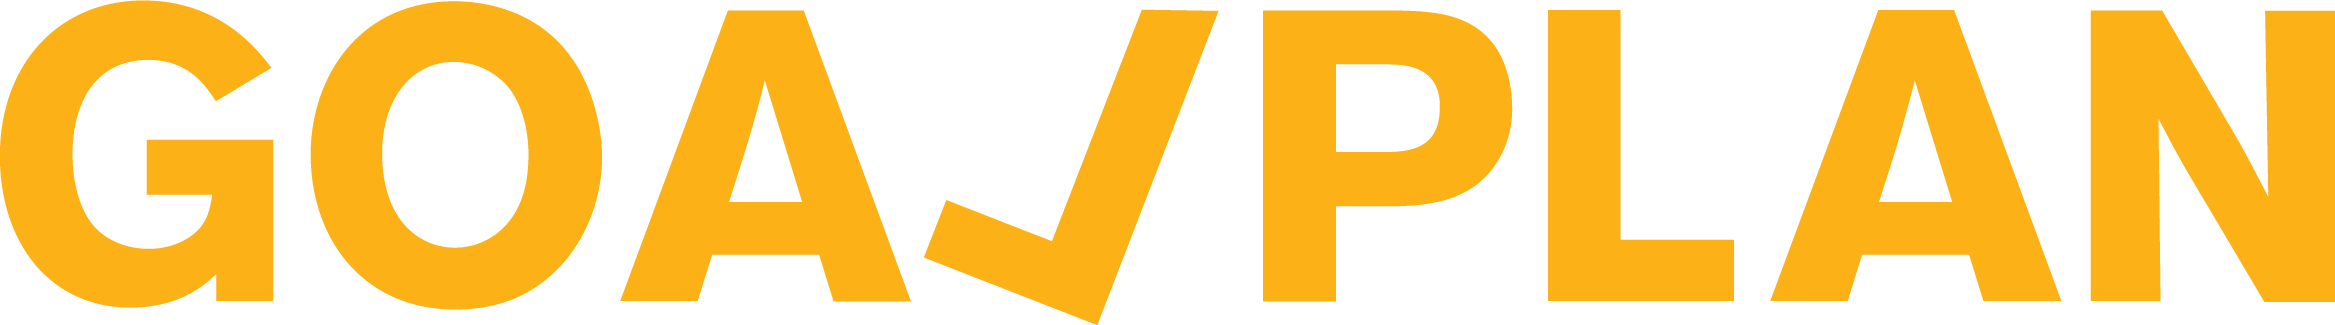 Goalplan_logo_yellow@4x (3)